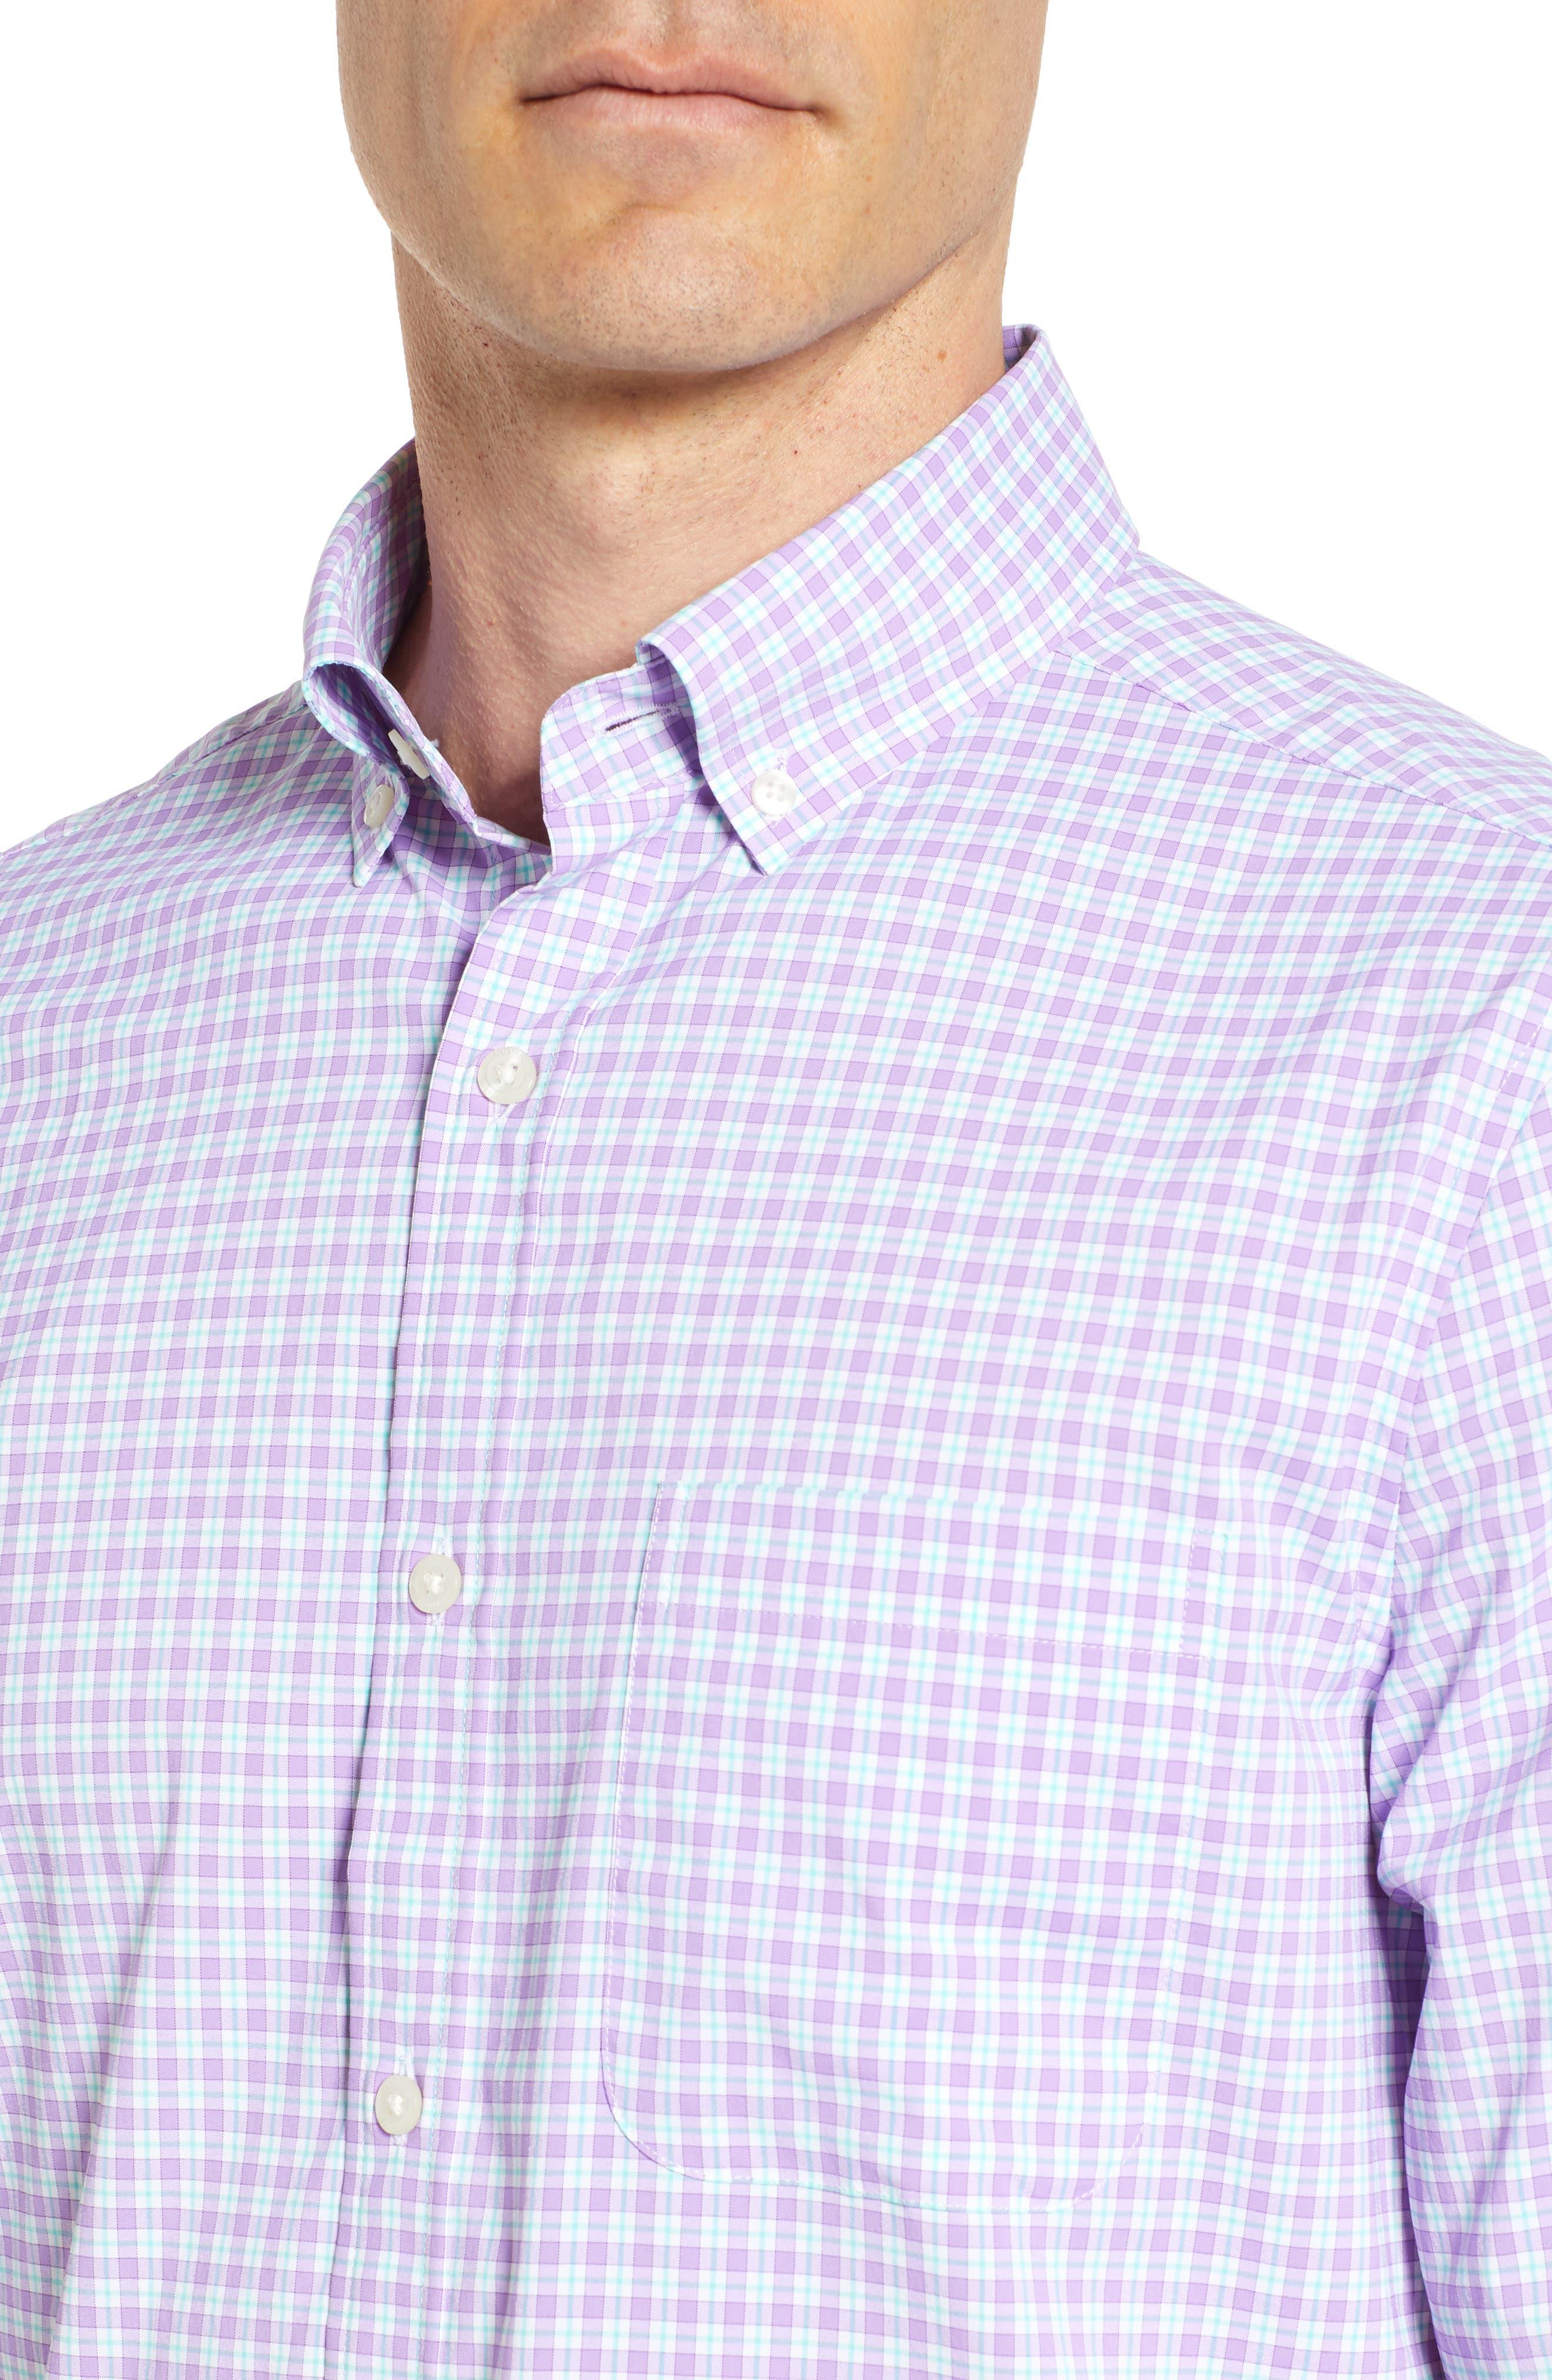 Oyster Pond Slim Fit Plaid Sport Shirt,                             Alternate thumbnail 2, color,                             Sea Urchin